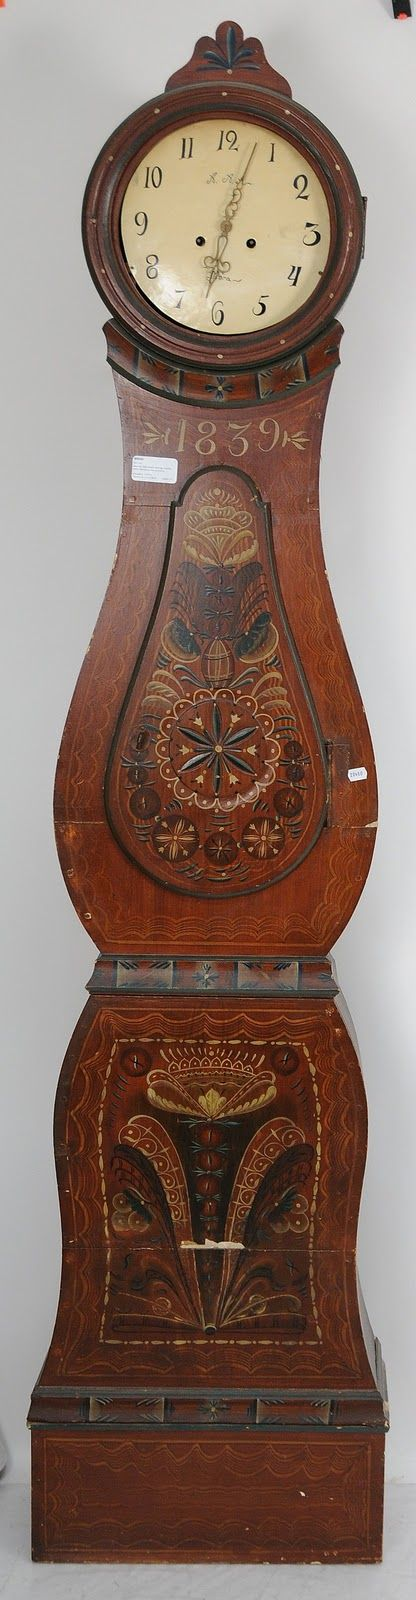 Grandfather Clock: